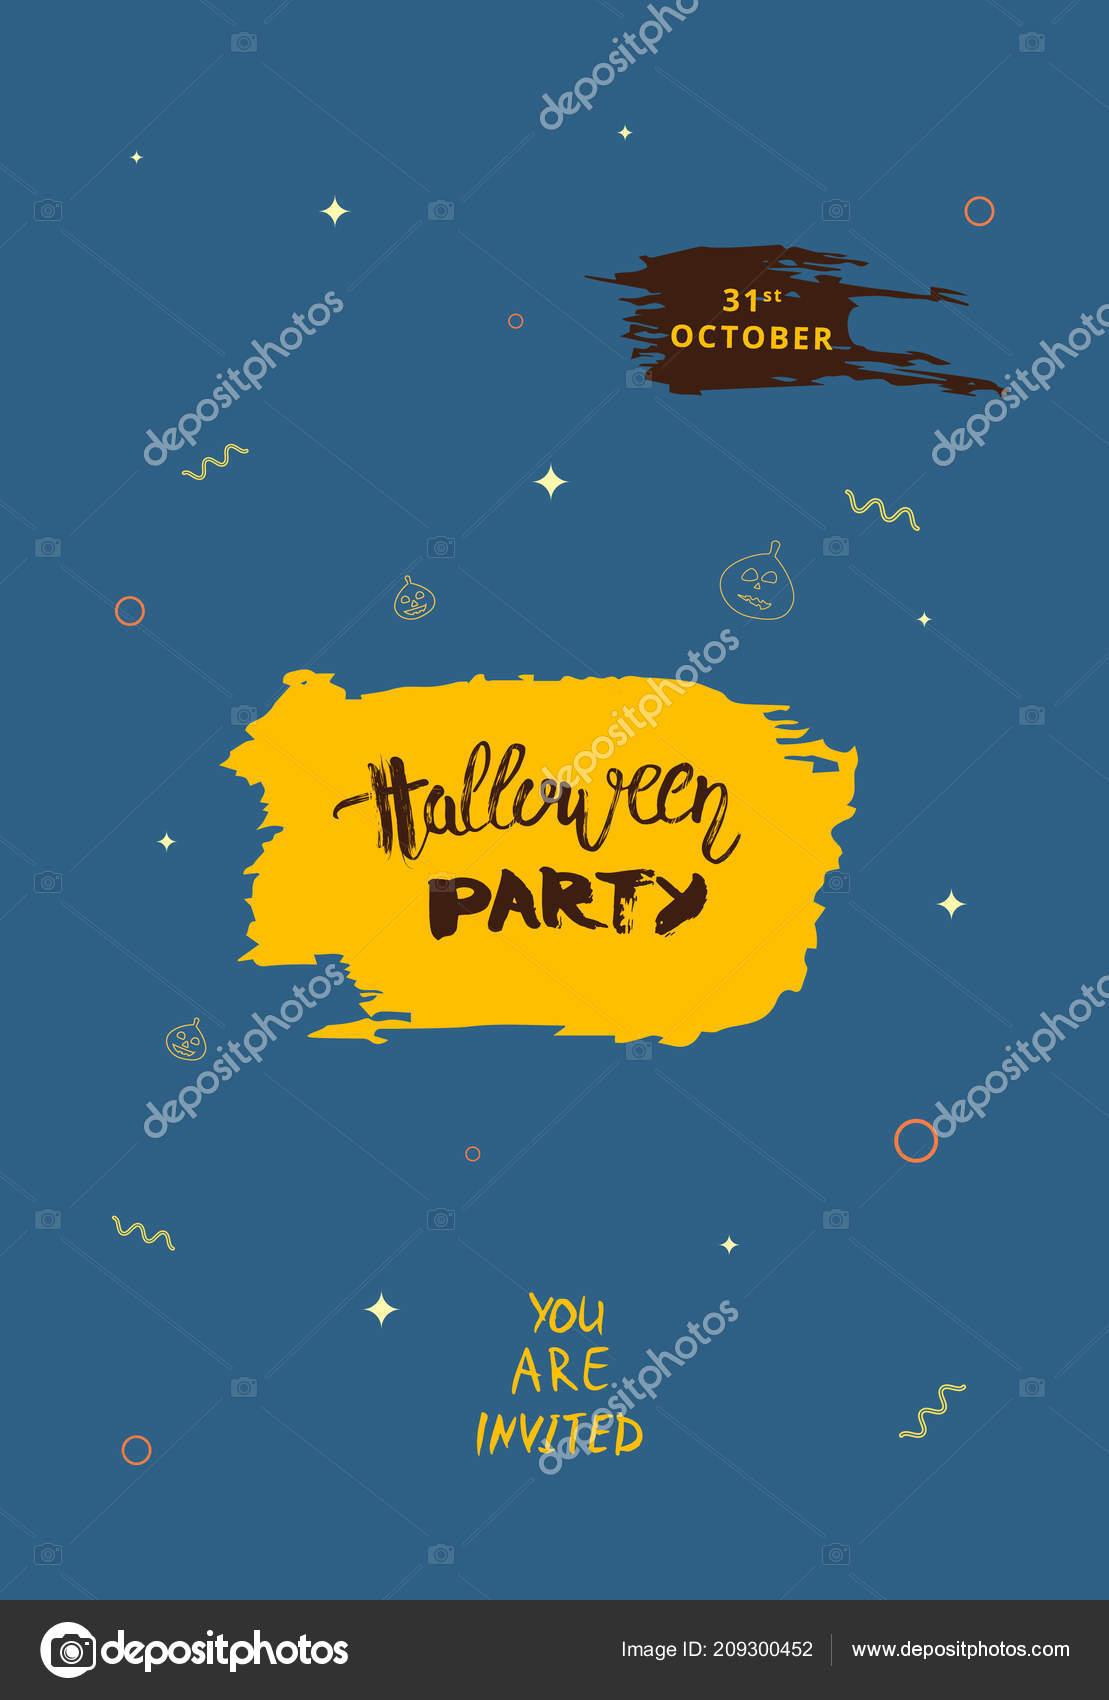 Halloween Party Template Handwritten Lettering Decoration Vertical